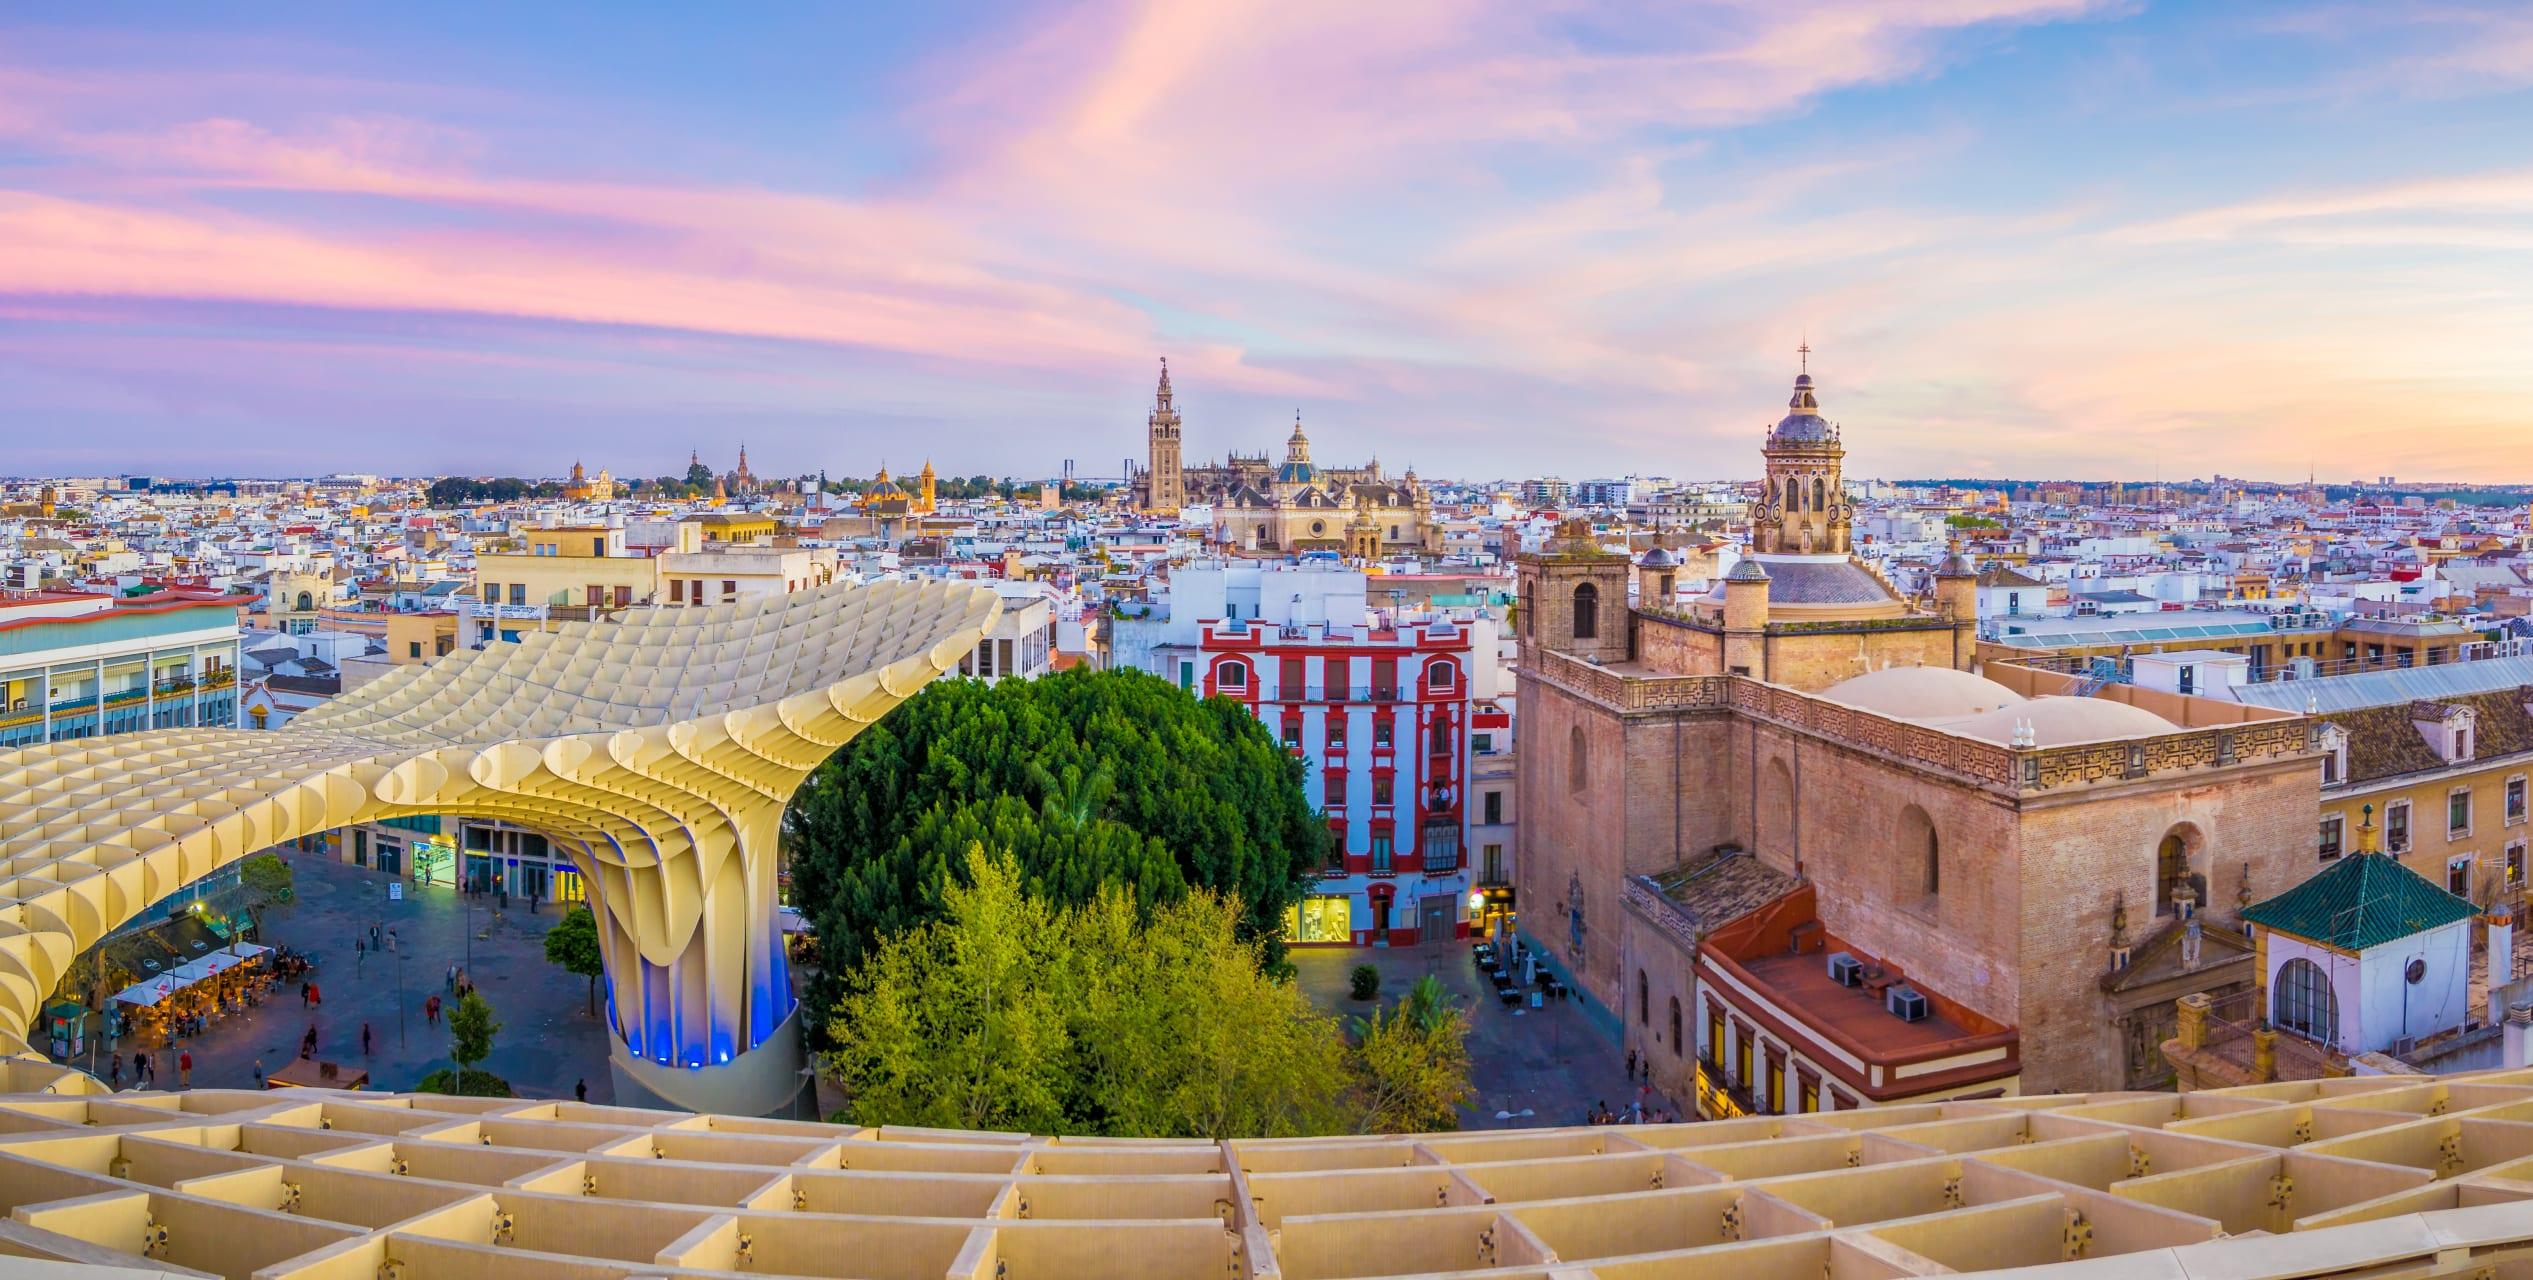 Seville - The Mushrooms: Seville's Trippiest Monument